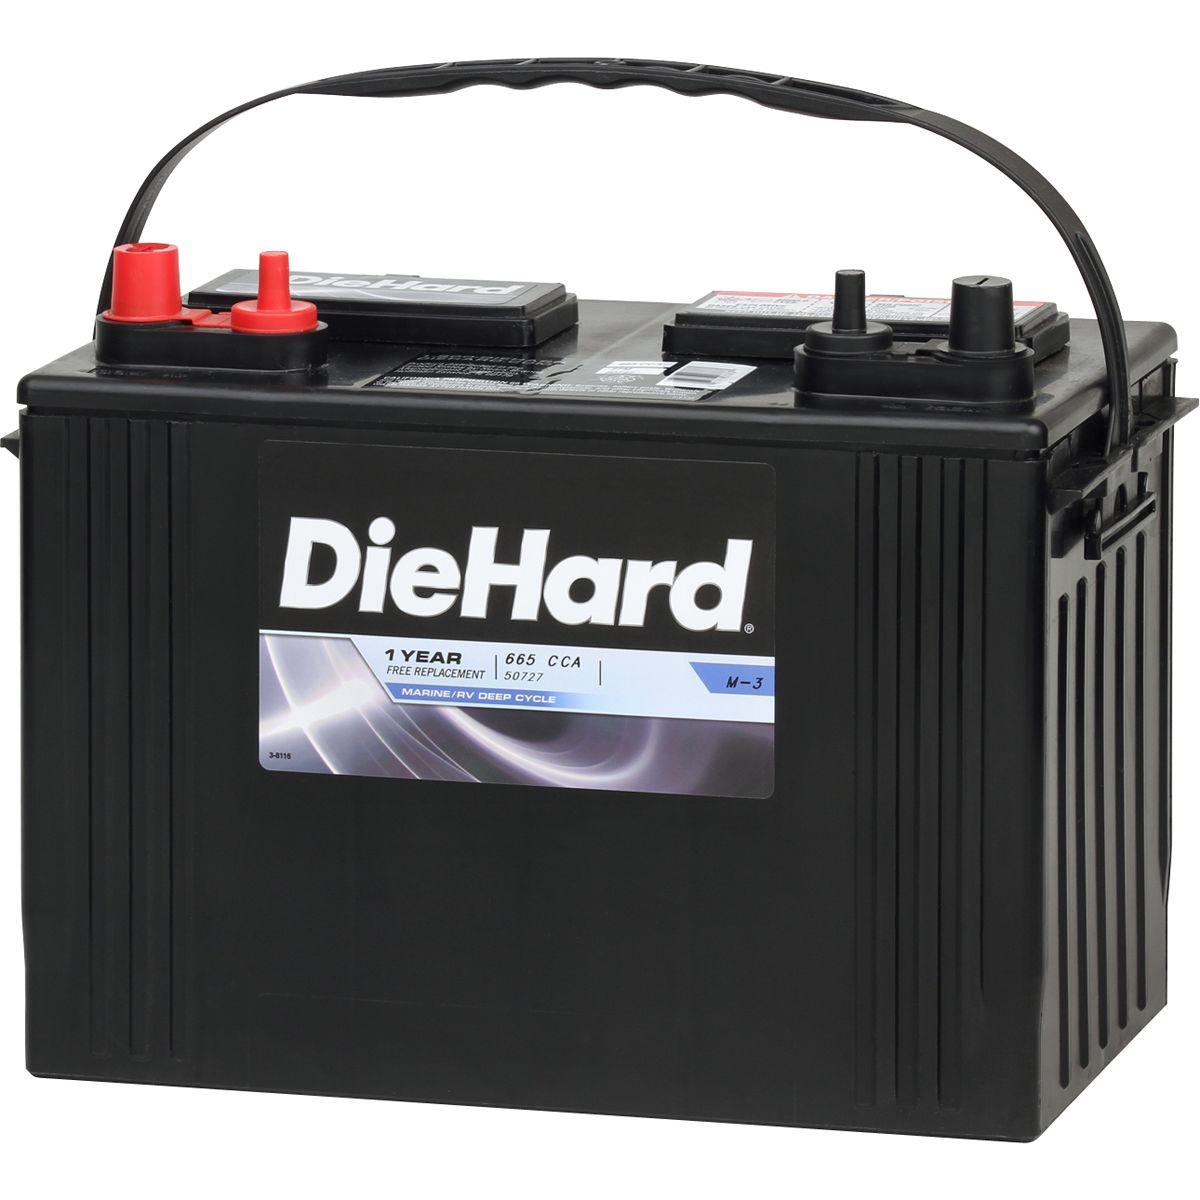 Image of DieHard Marine/RV Battery 50727 - Group Size 27M (Price With Exchange)